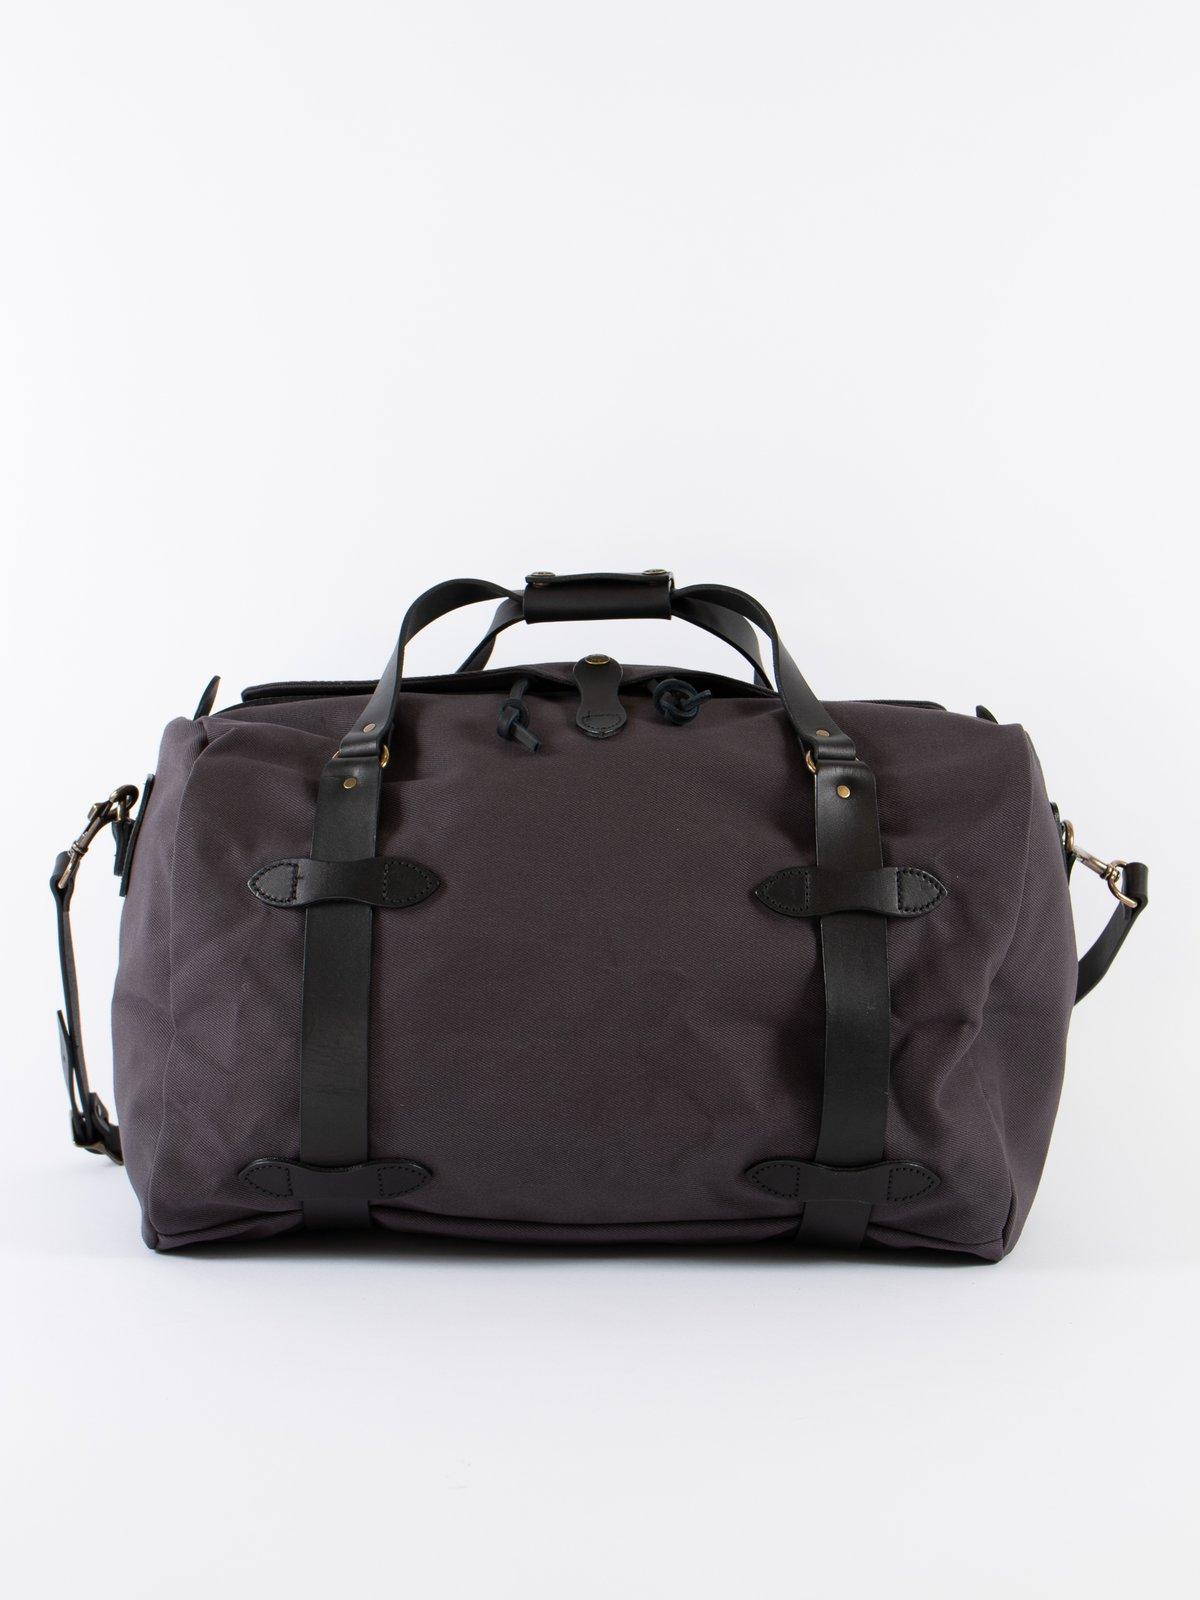 efa1415dc4 Cinder Medium Duffle Bag by Filson – The Bureau Belfast - The Bureau ...